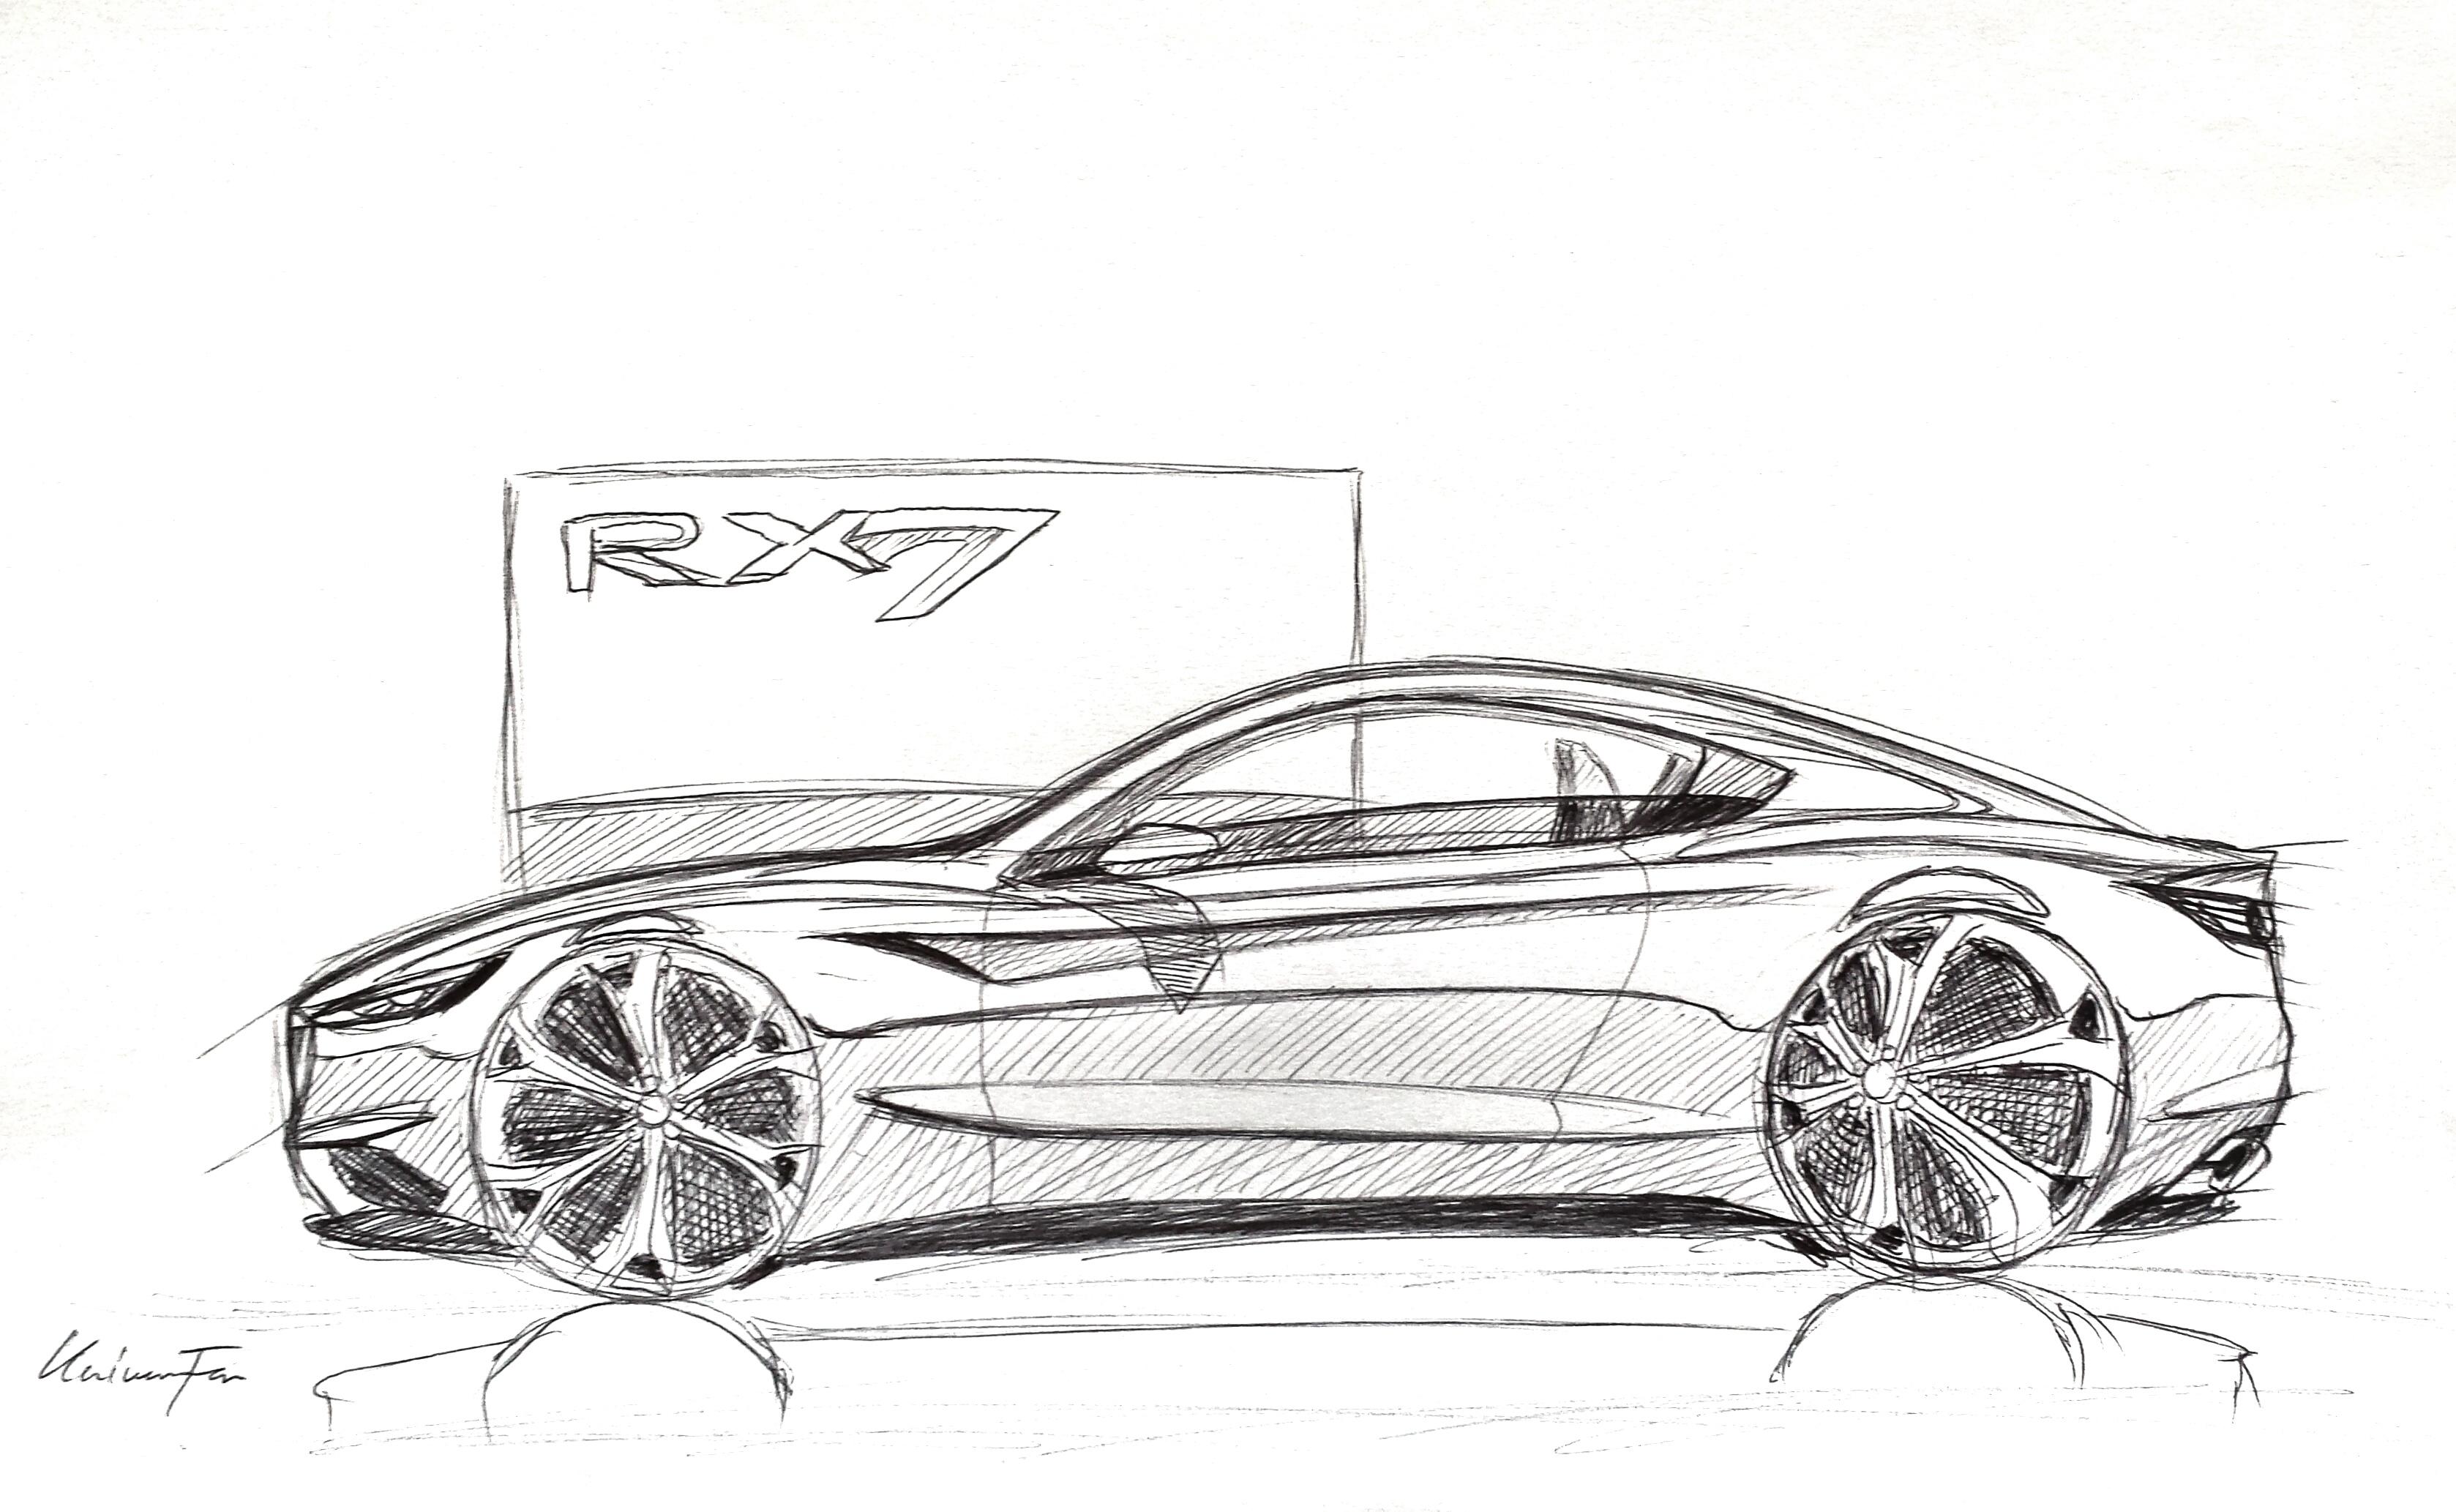 Older pen sketch sketch. New Mazda RX-7